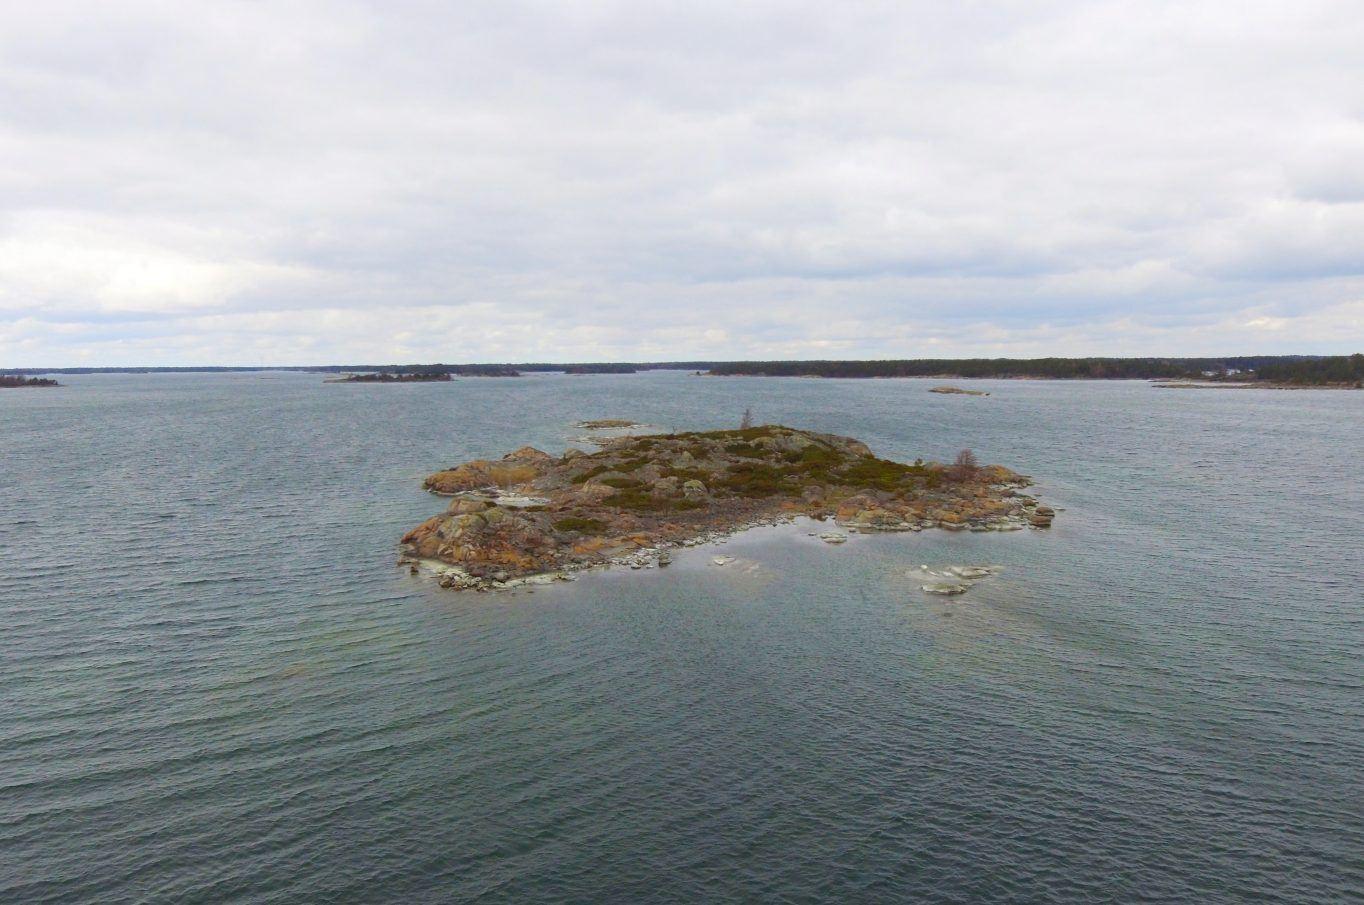 Rönnkobben i Kallsö, Föglö